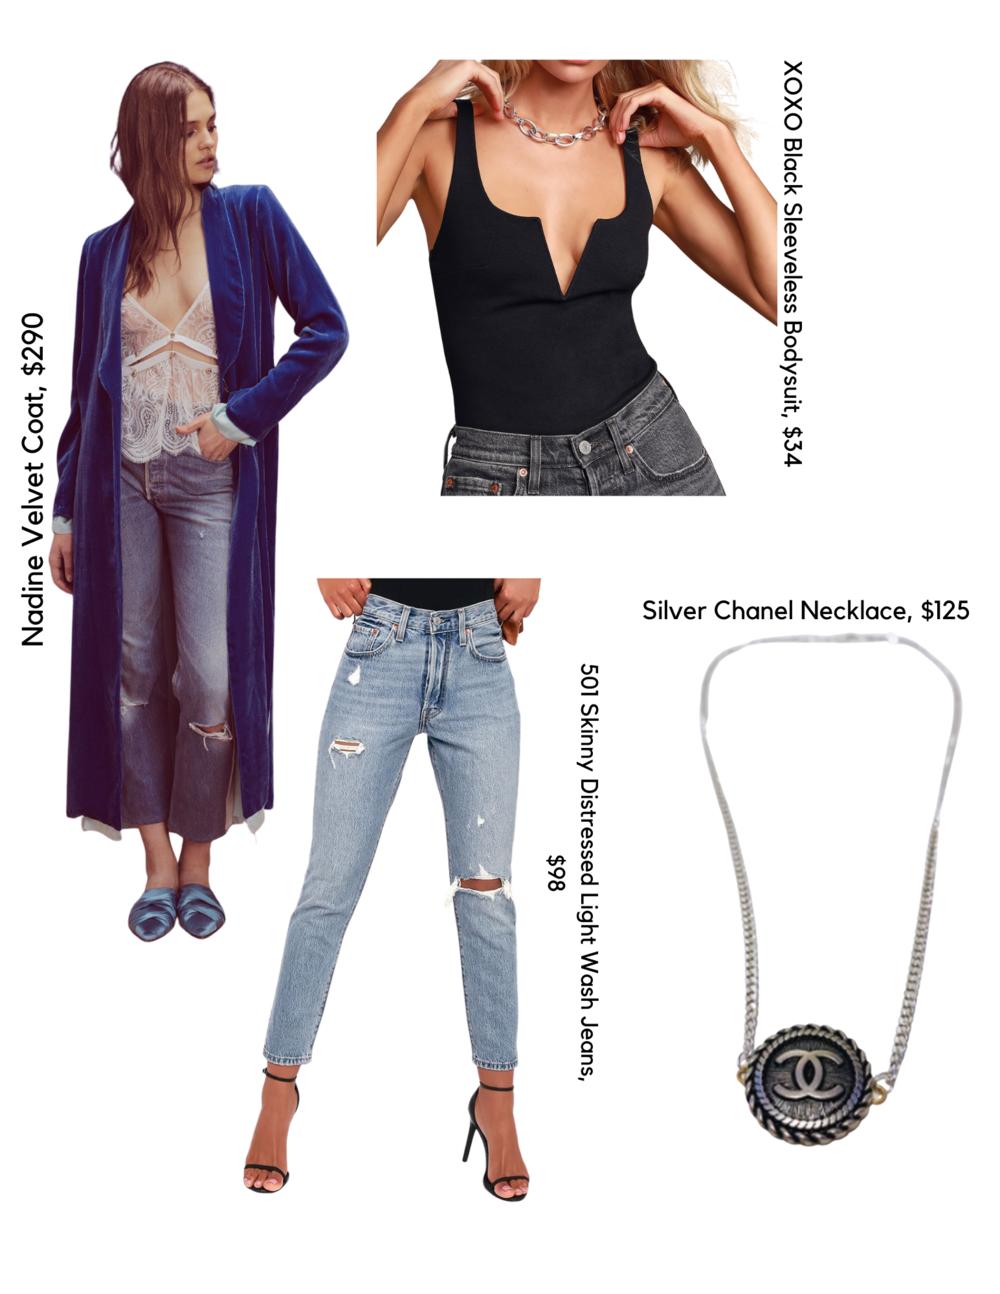 SHOP THE LOOK:   Nadine Velvet Coat, $290  /  Black Bodysuit, $34  /  Jeans, $98  /  Chanel Necklace, $125